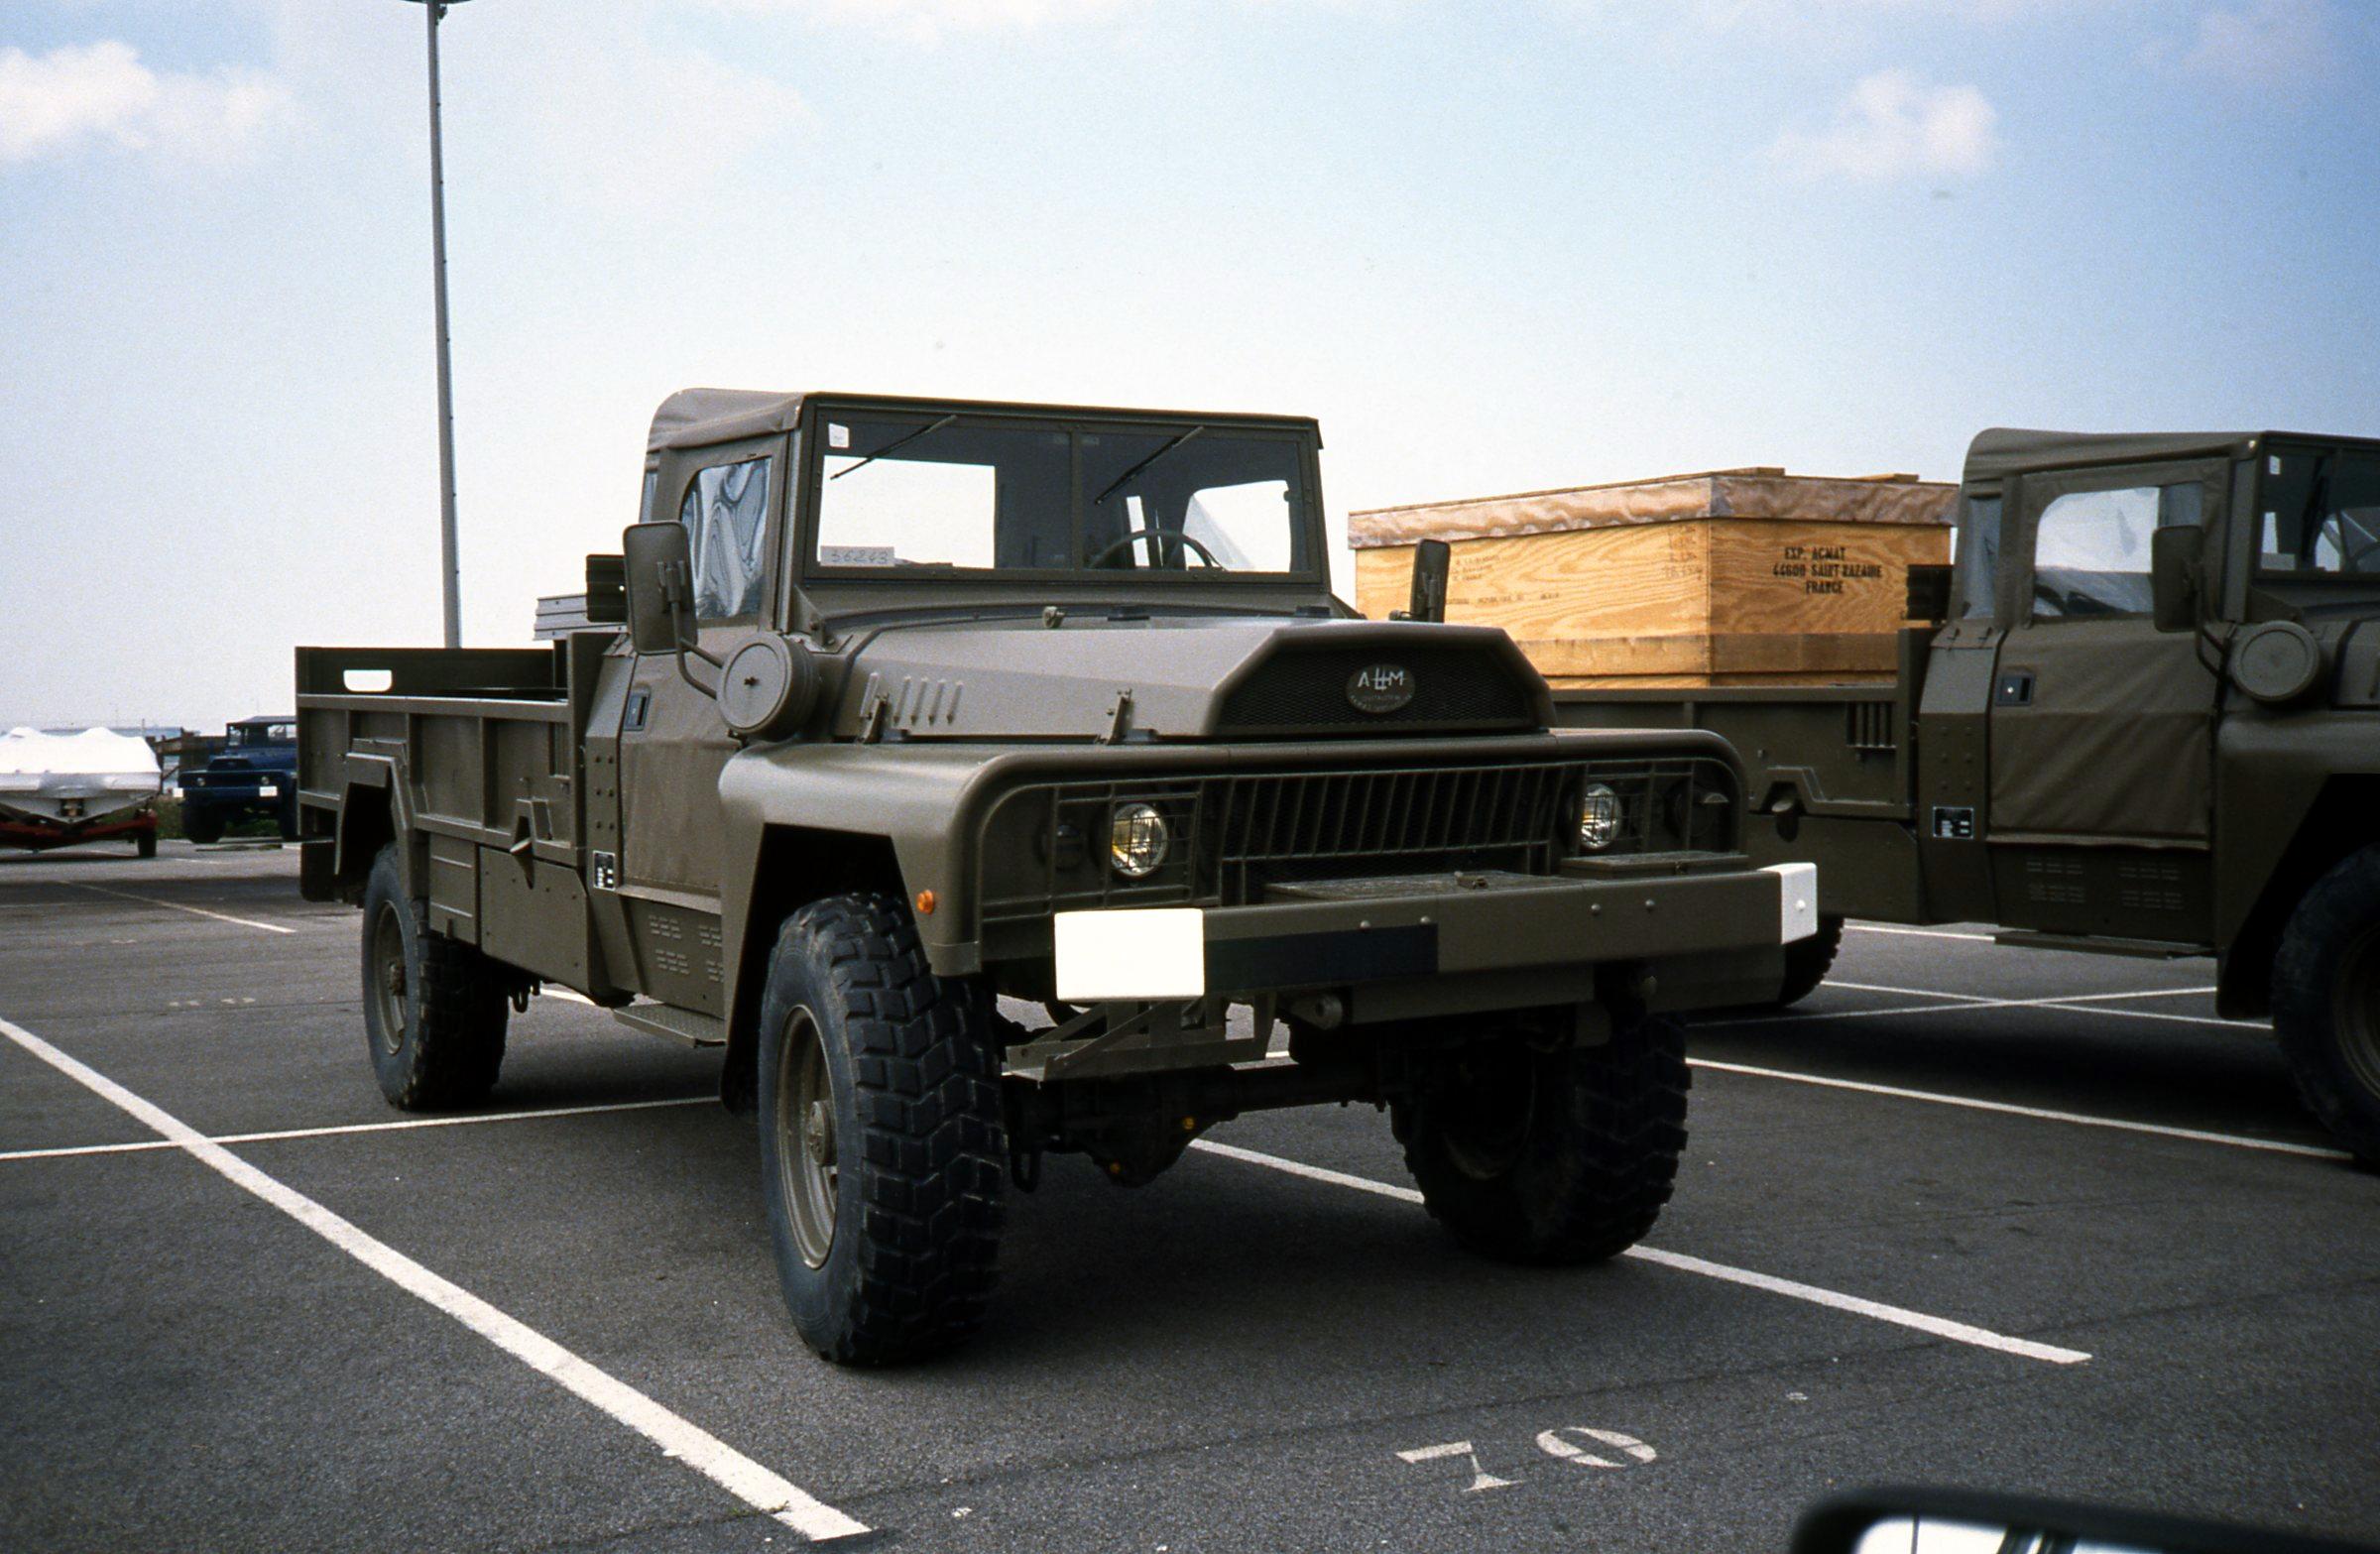 Photos - Logistique et Camions / Logistics and Trucks - Page 6 34912893325_c28ef74261_o